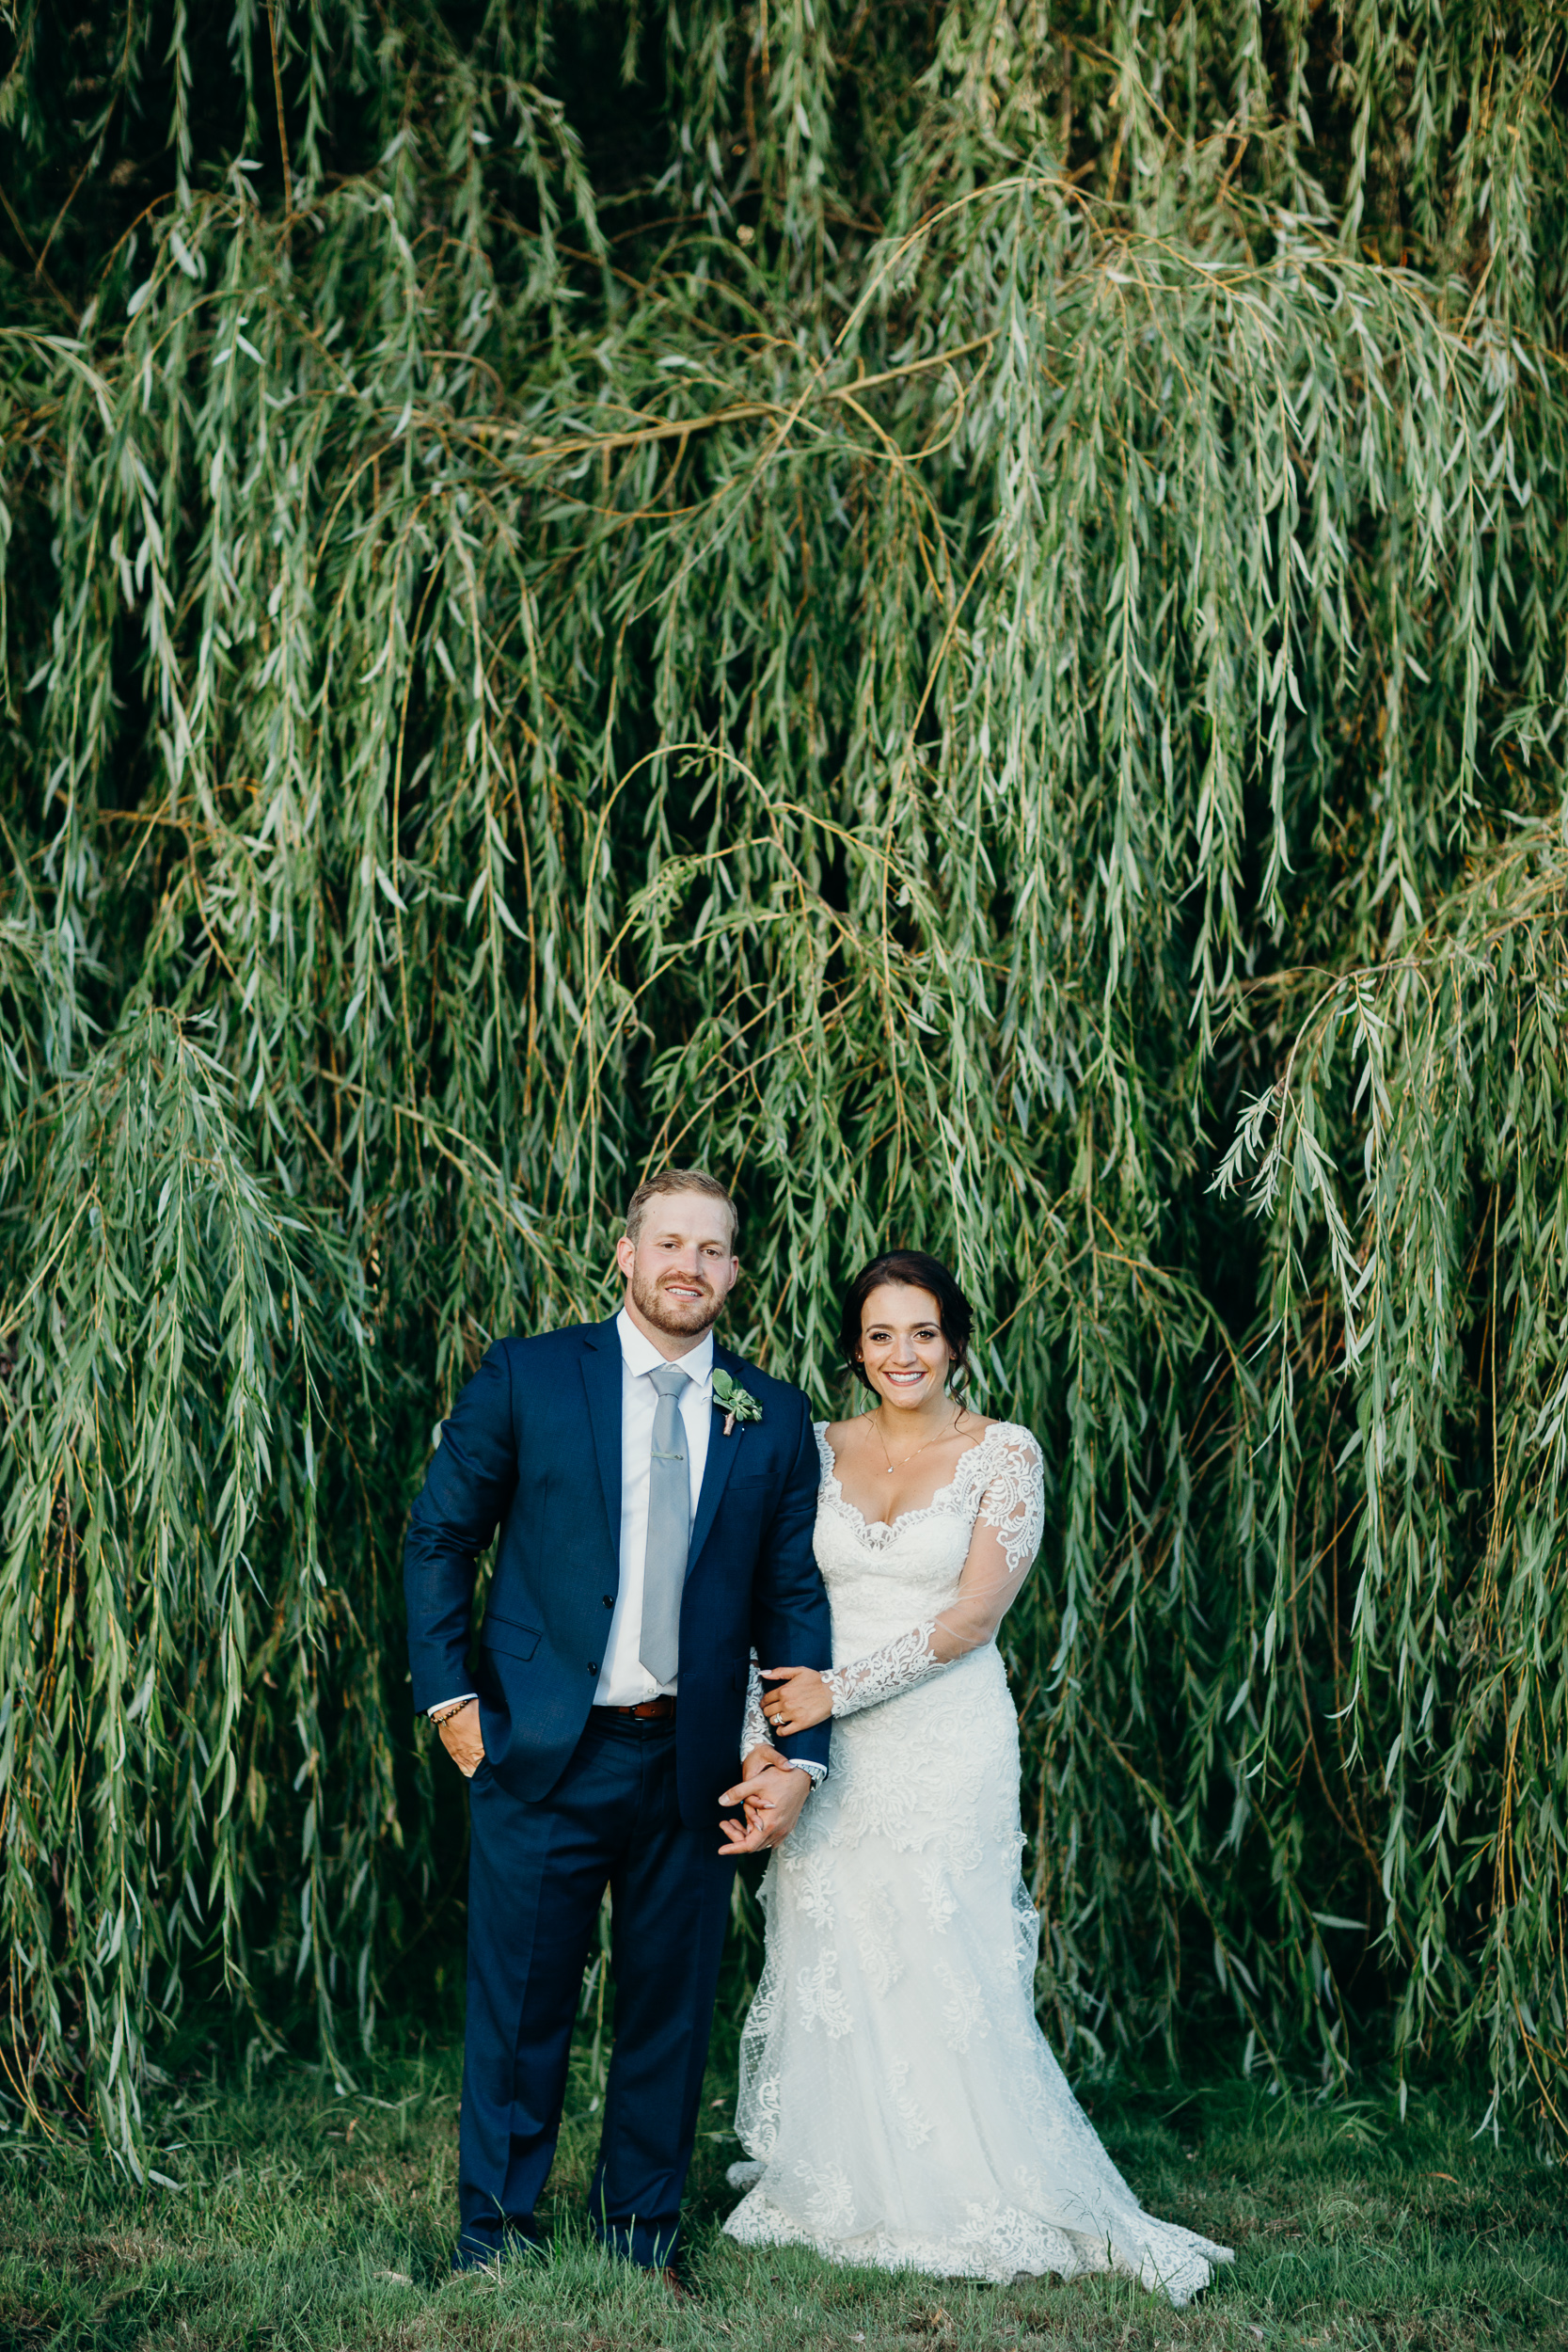 20170820 Savanna & Vince Wedding 428.jpg